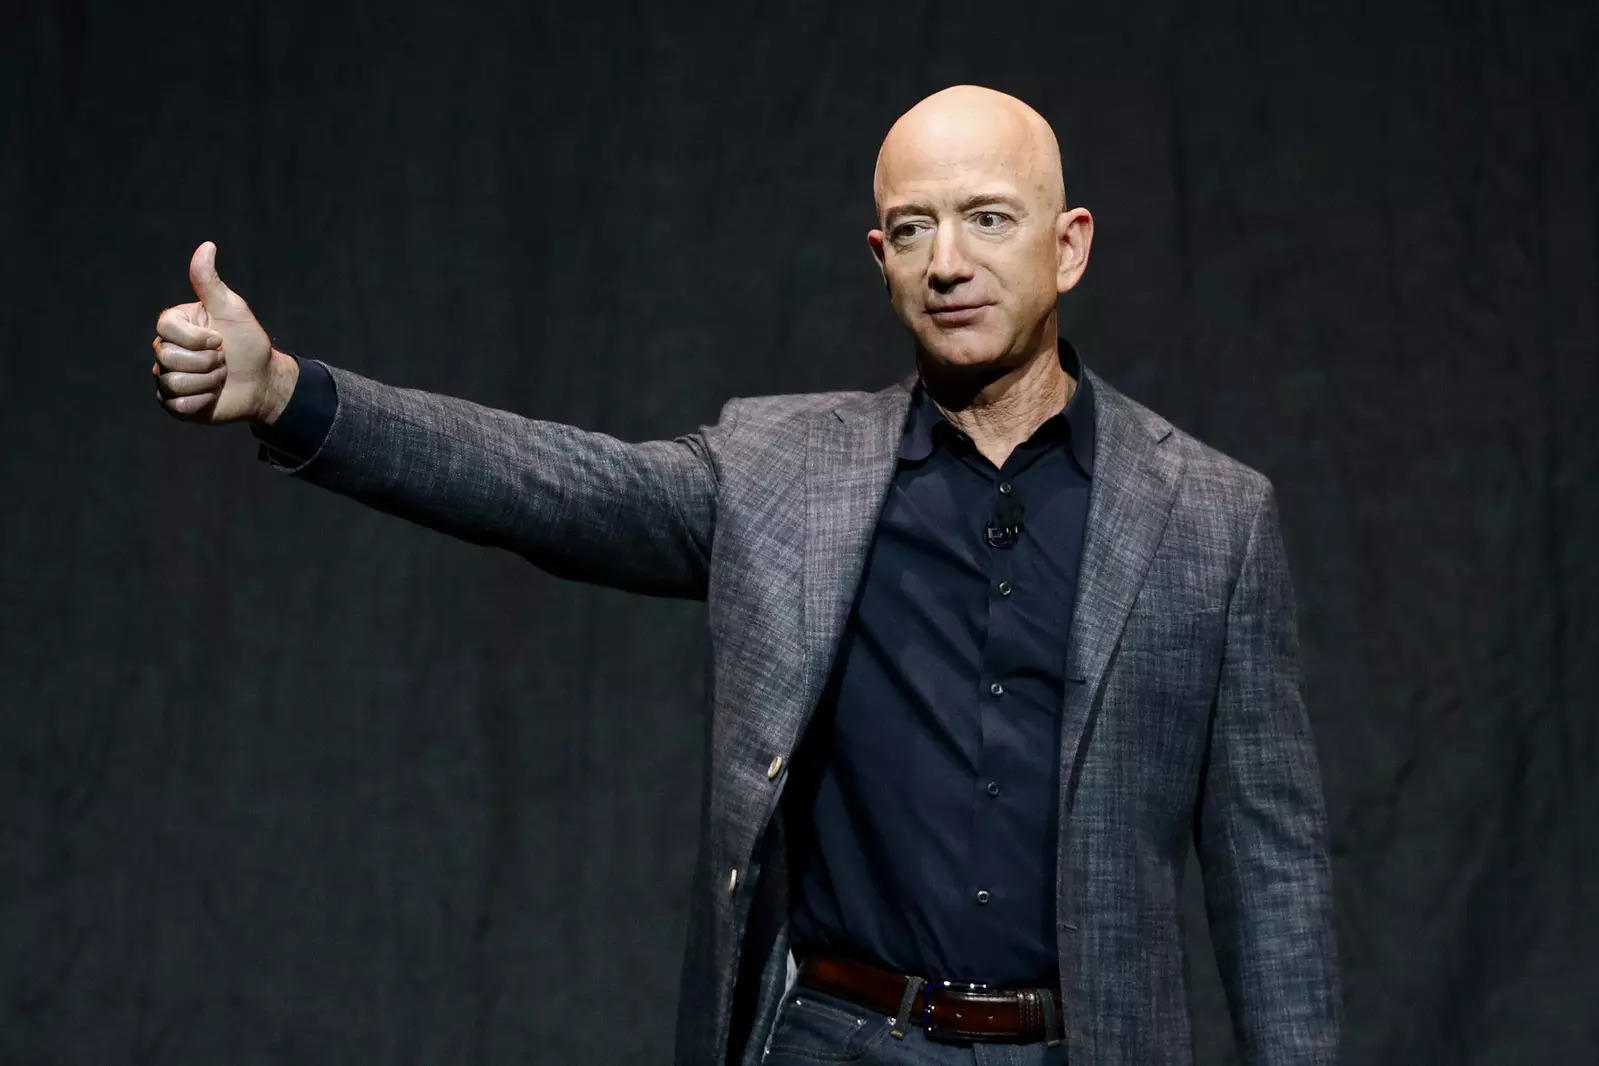 UK PM To Challenge Jeff Bezos Over Amazon Tax Record: Report